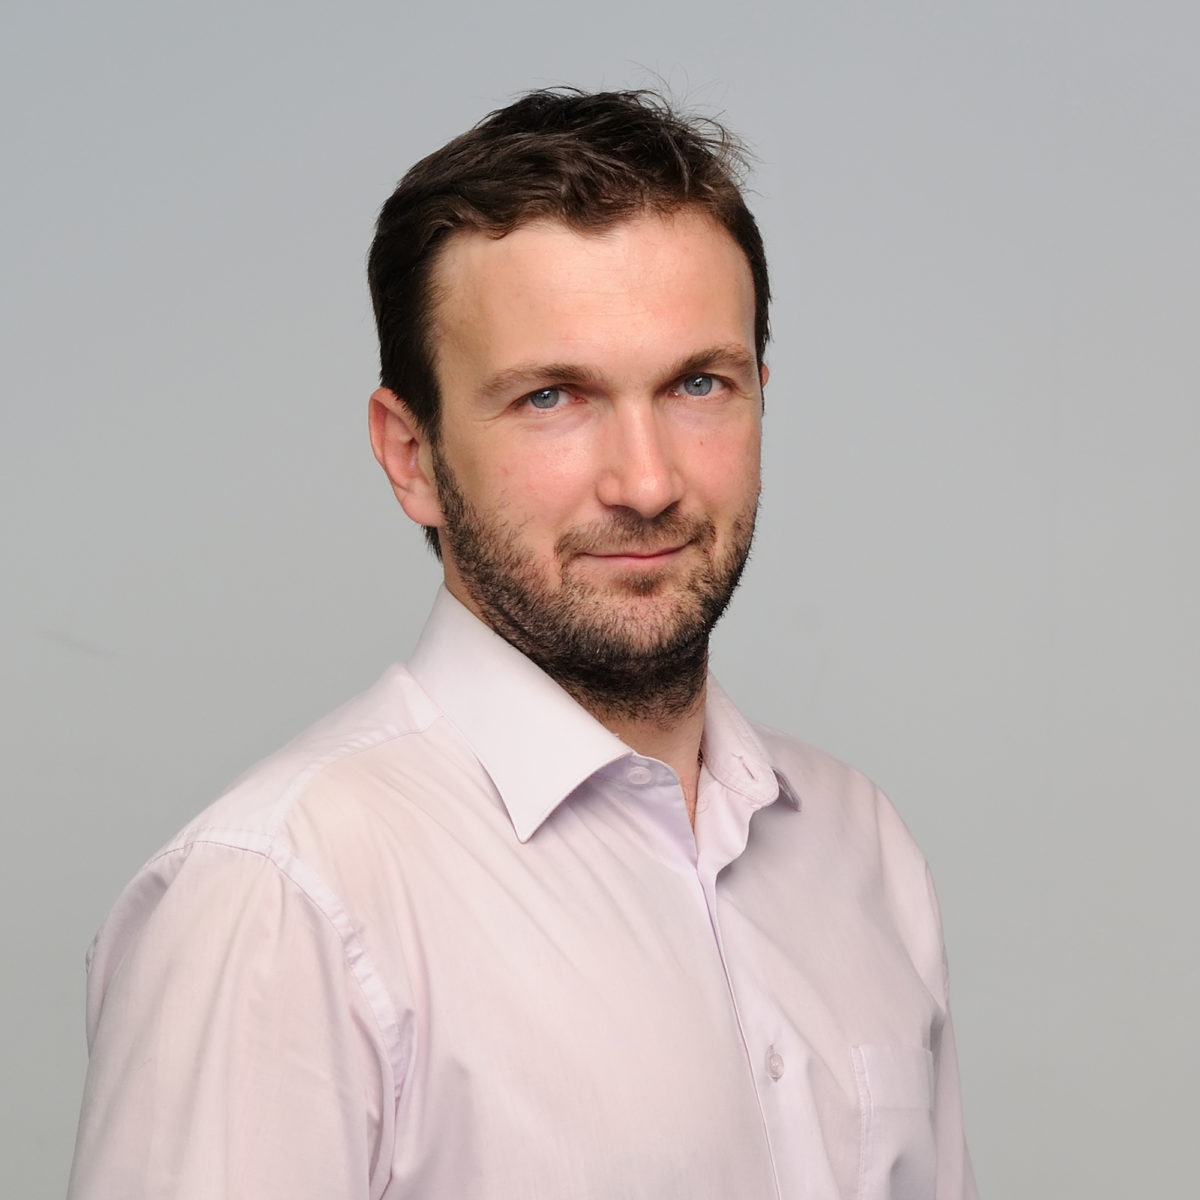 Kurbatsky Alexey Nikolaevich